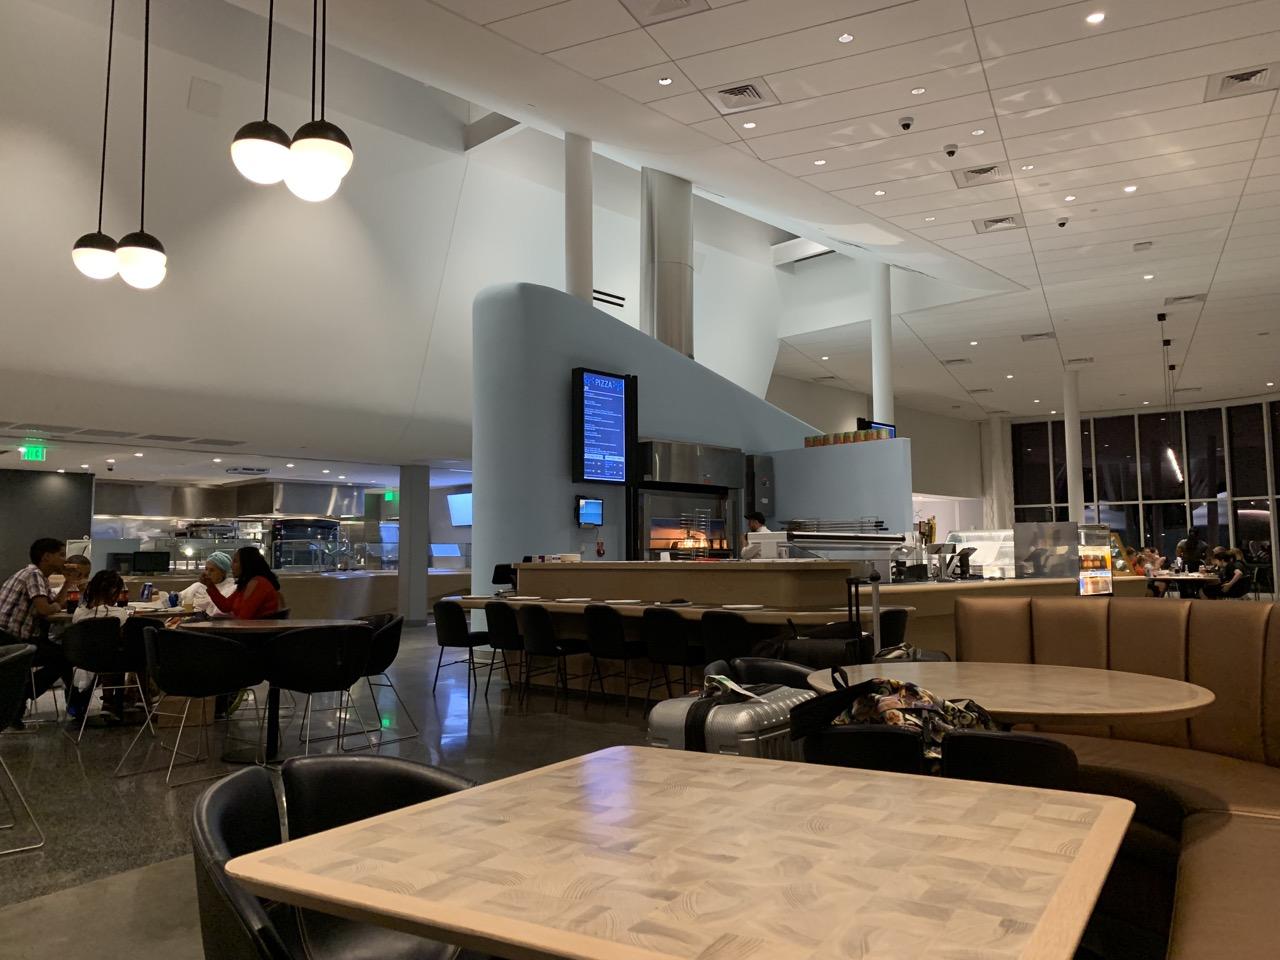 universal aventura hotel review food court 1.jpeg